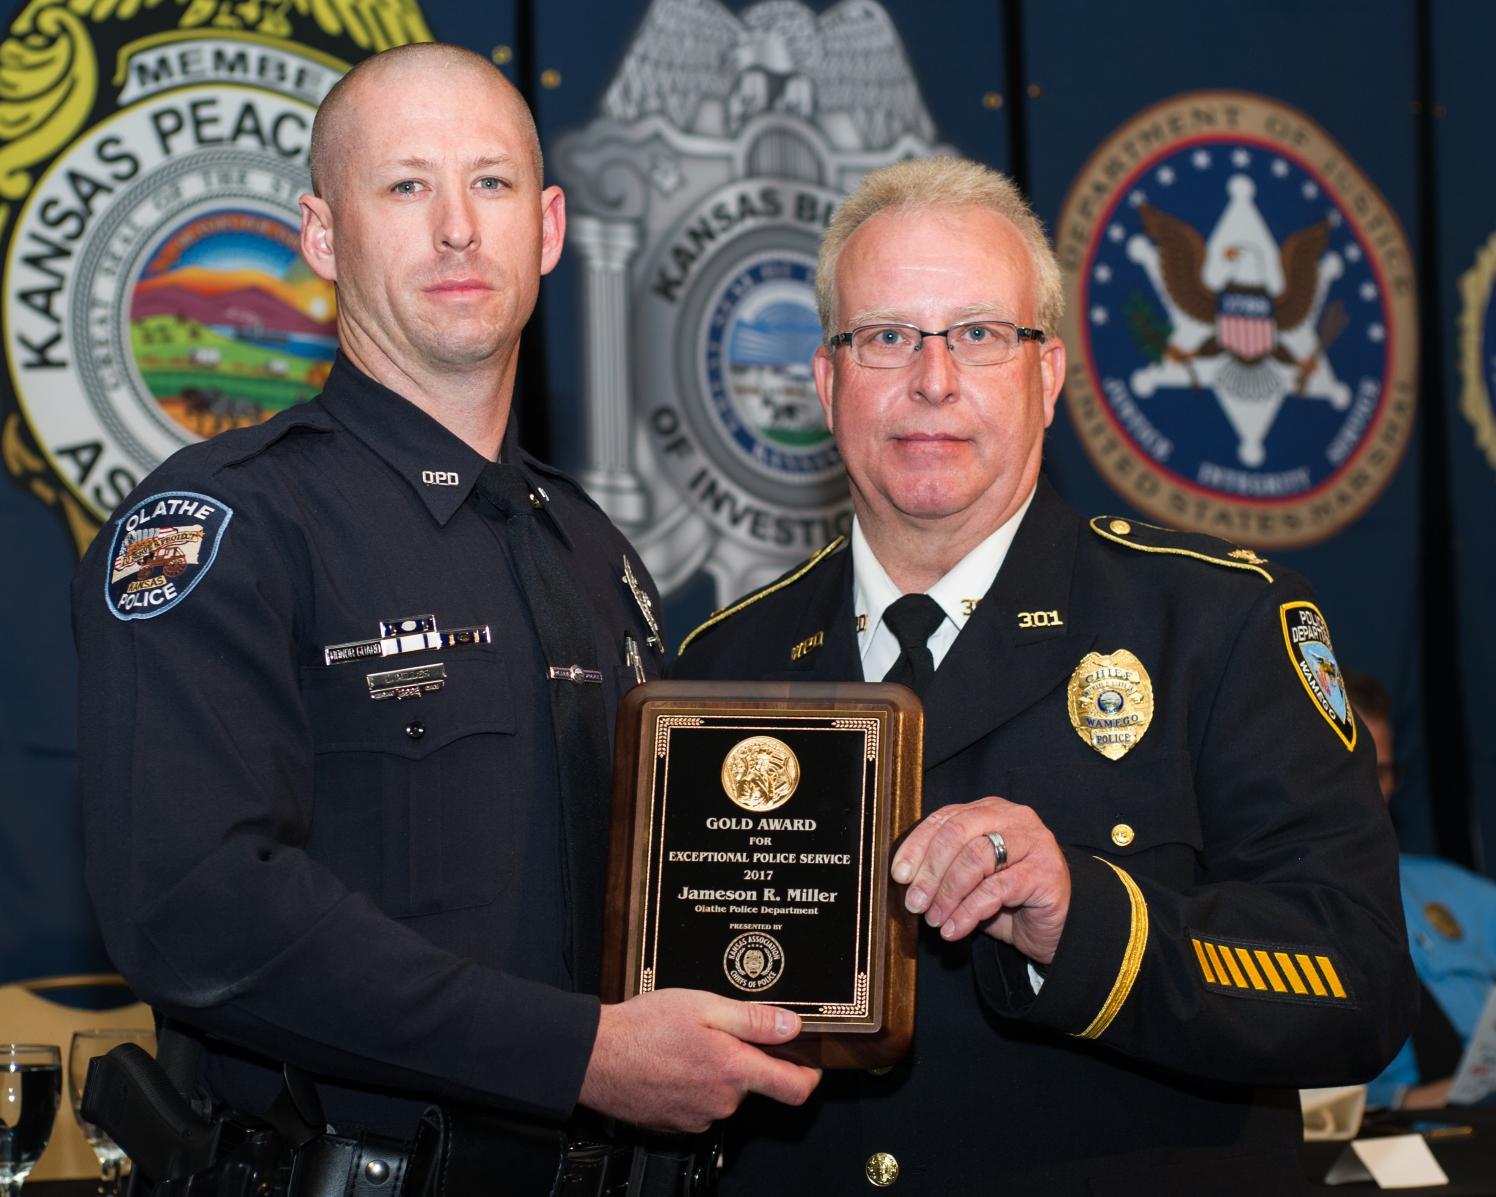 Awards – Kansas Association of Chiefs of Police -Members